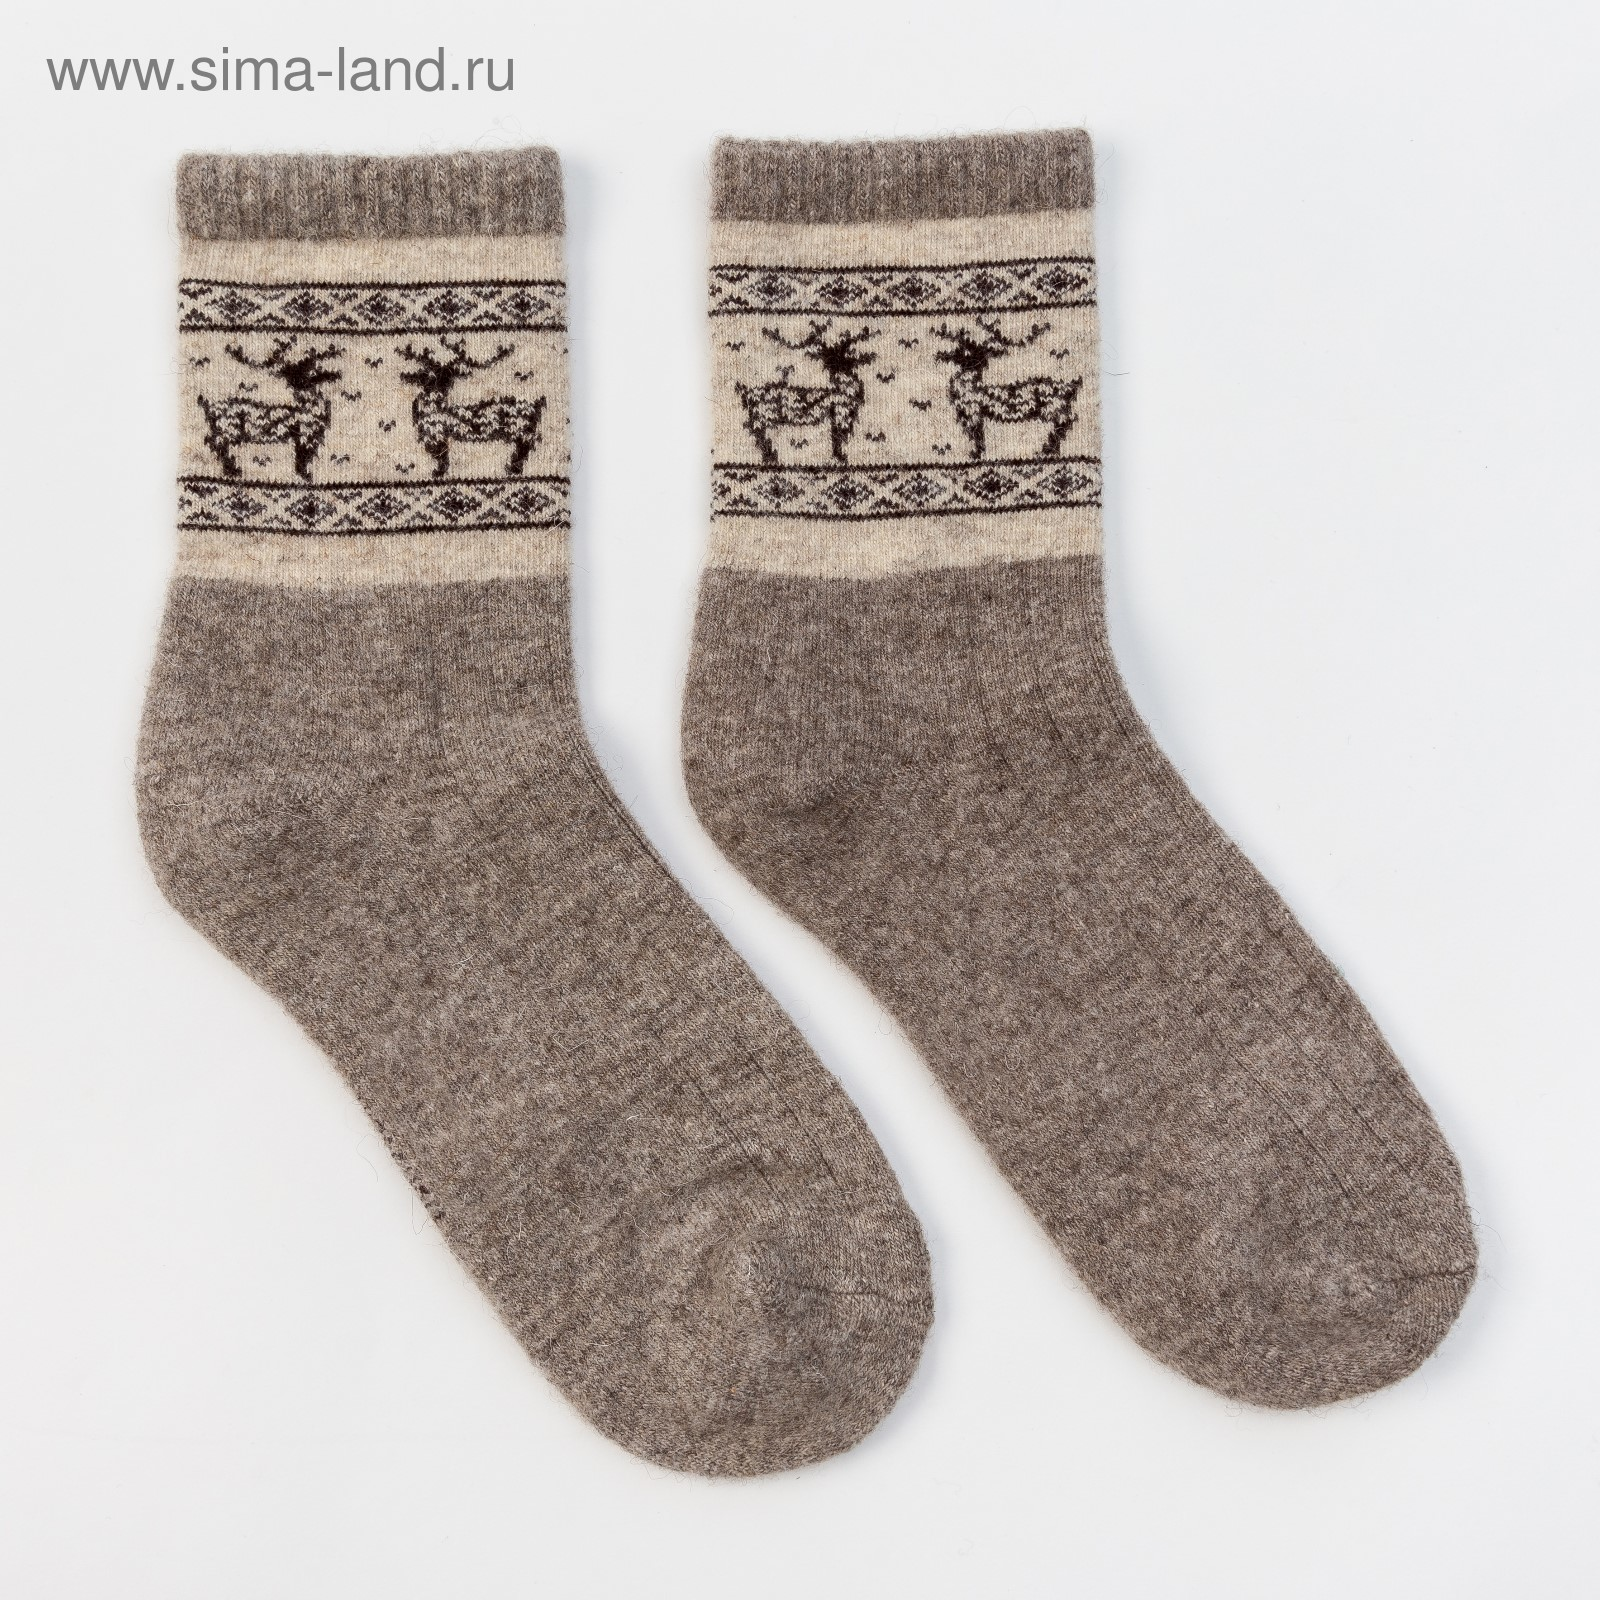 29e3fc673a4e1 Носки новогодние мужские шерстяные Organic с оленями, цвет серый, размер 27  (40-